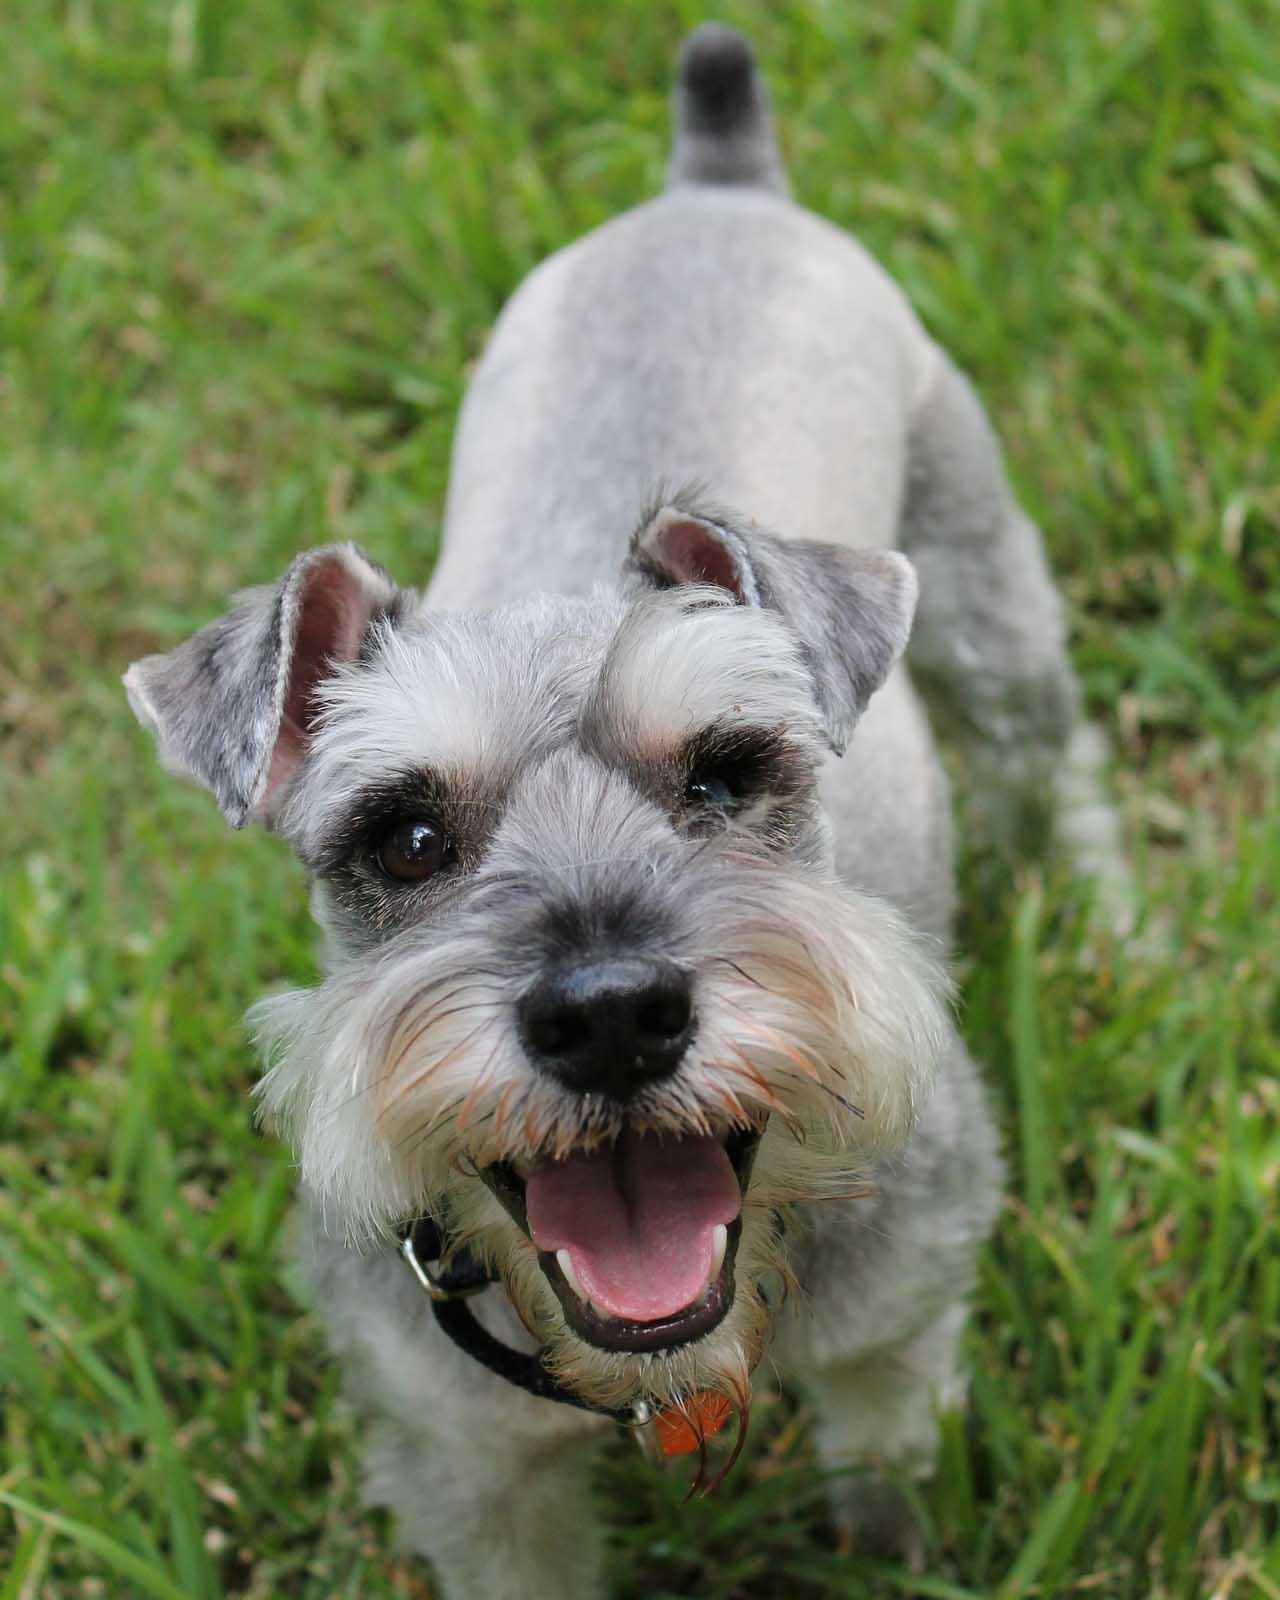 Smiling miniature schnauzer dog